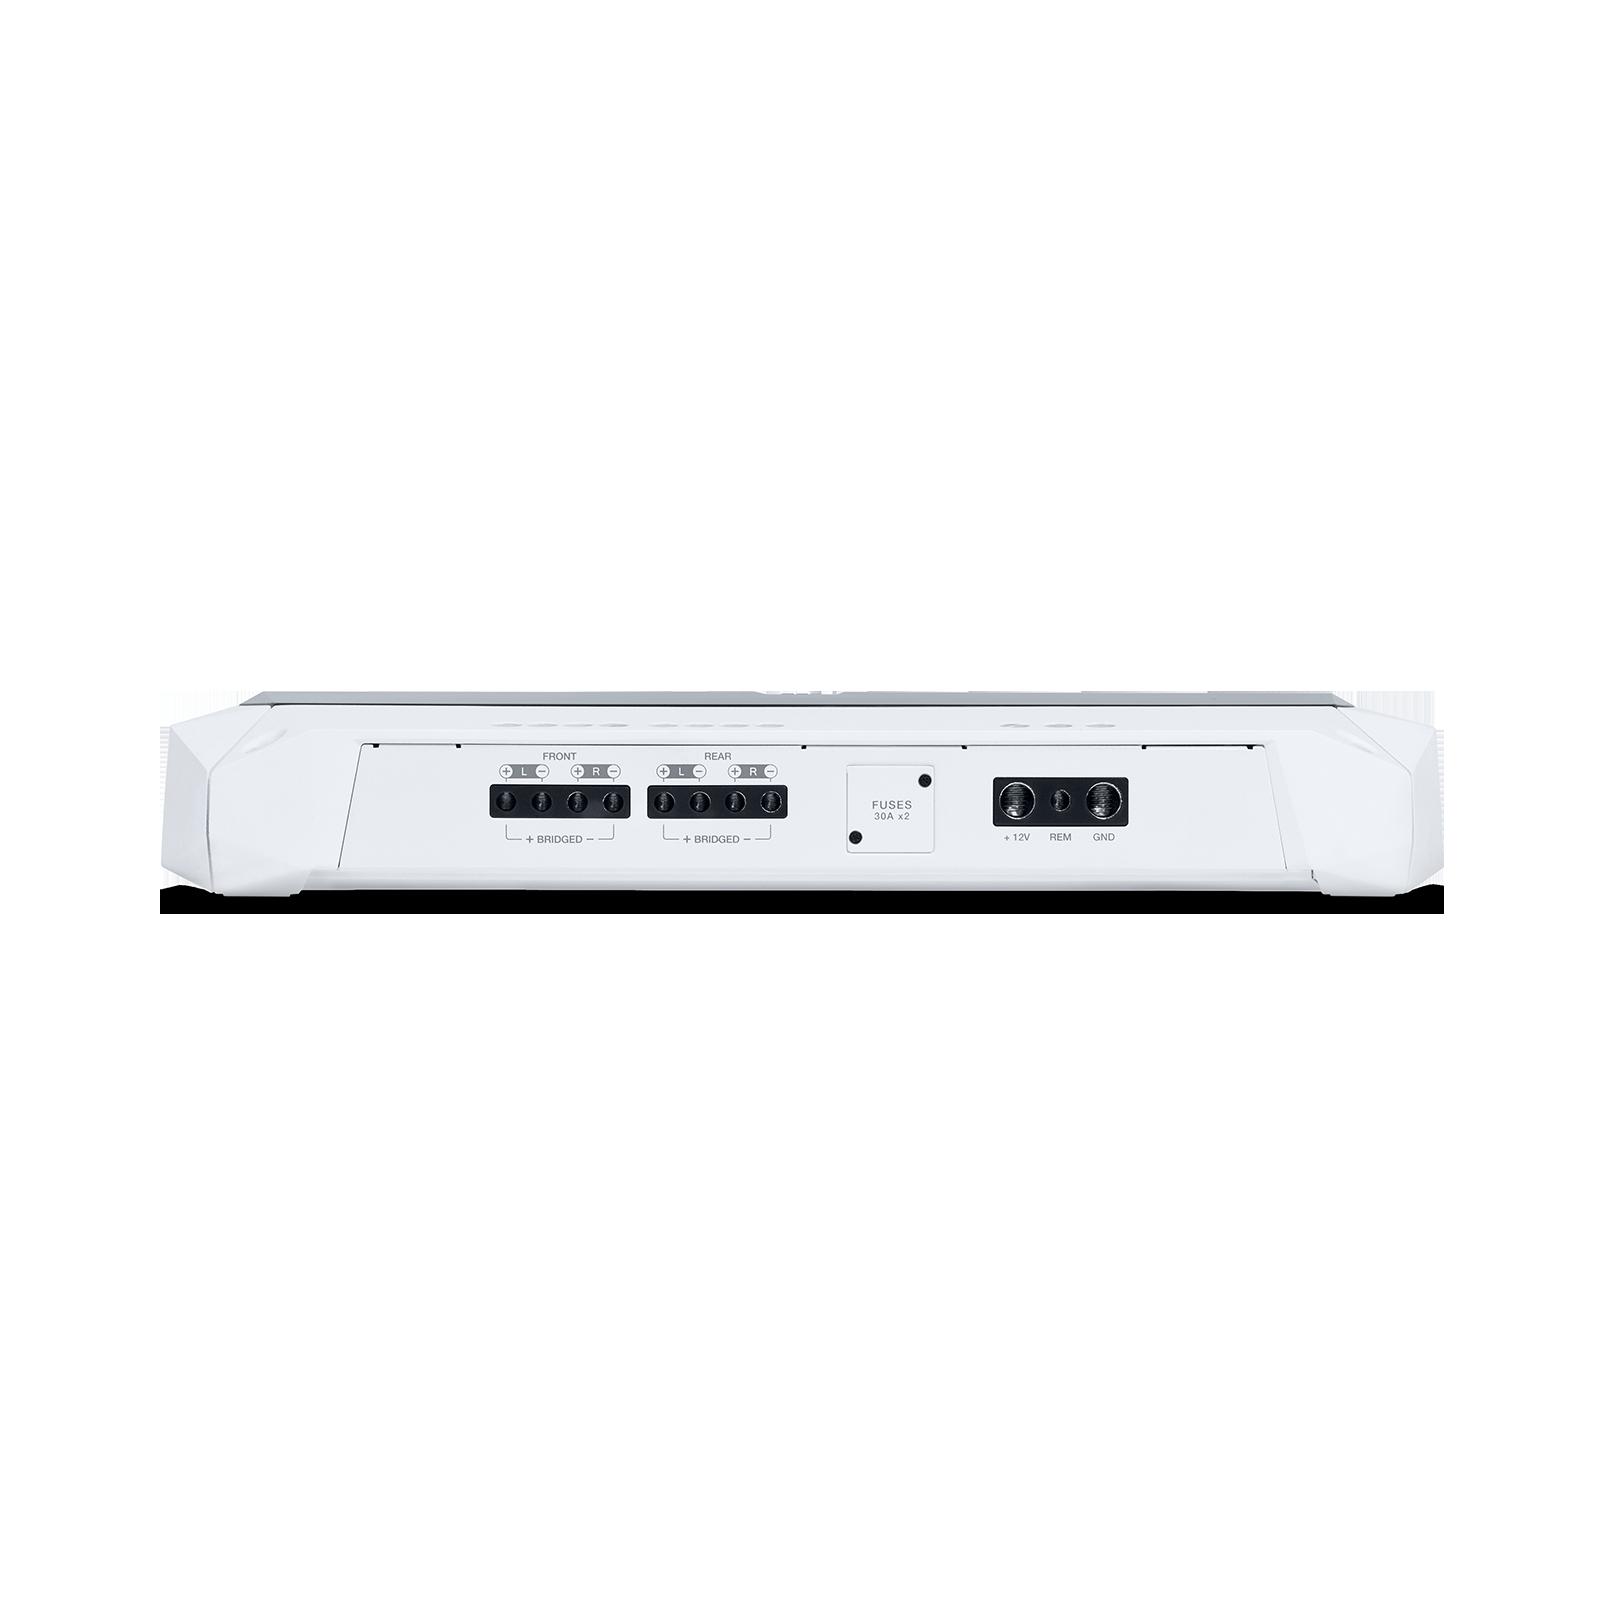 JBL Marine MA704 - White Matte - Multi-element high-performance, 4-channel amplifier - Detailshot 1